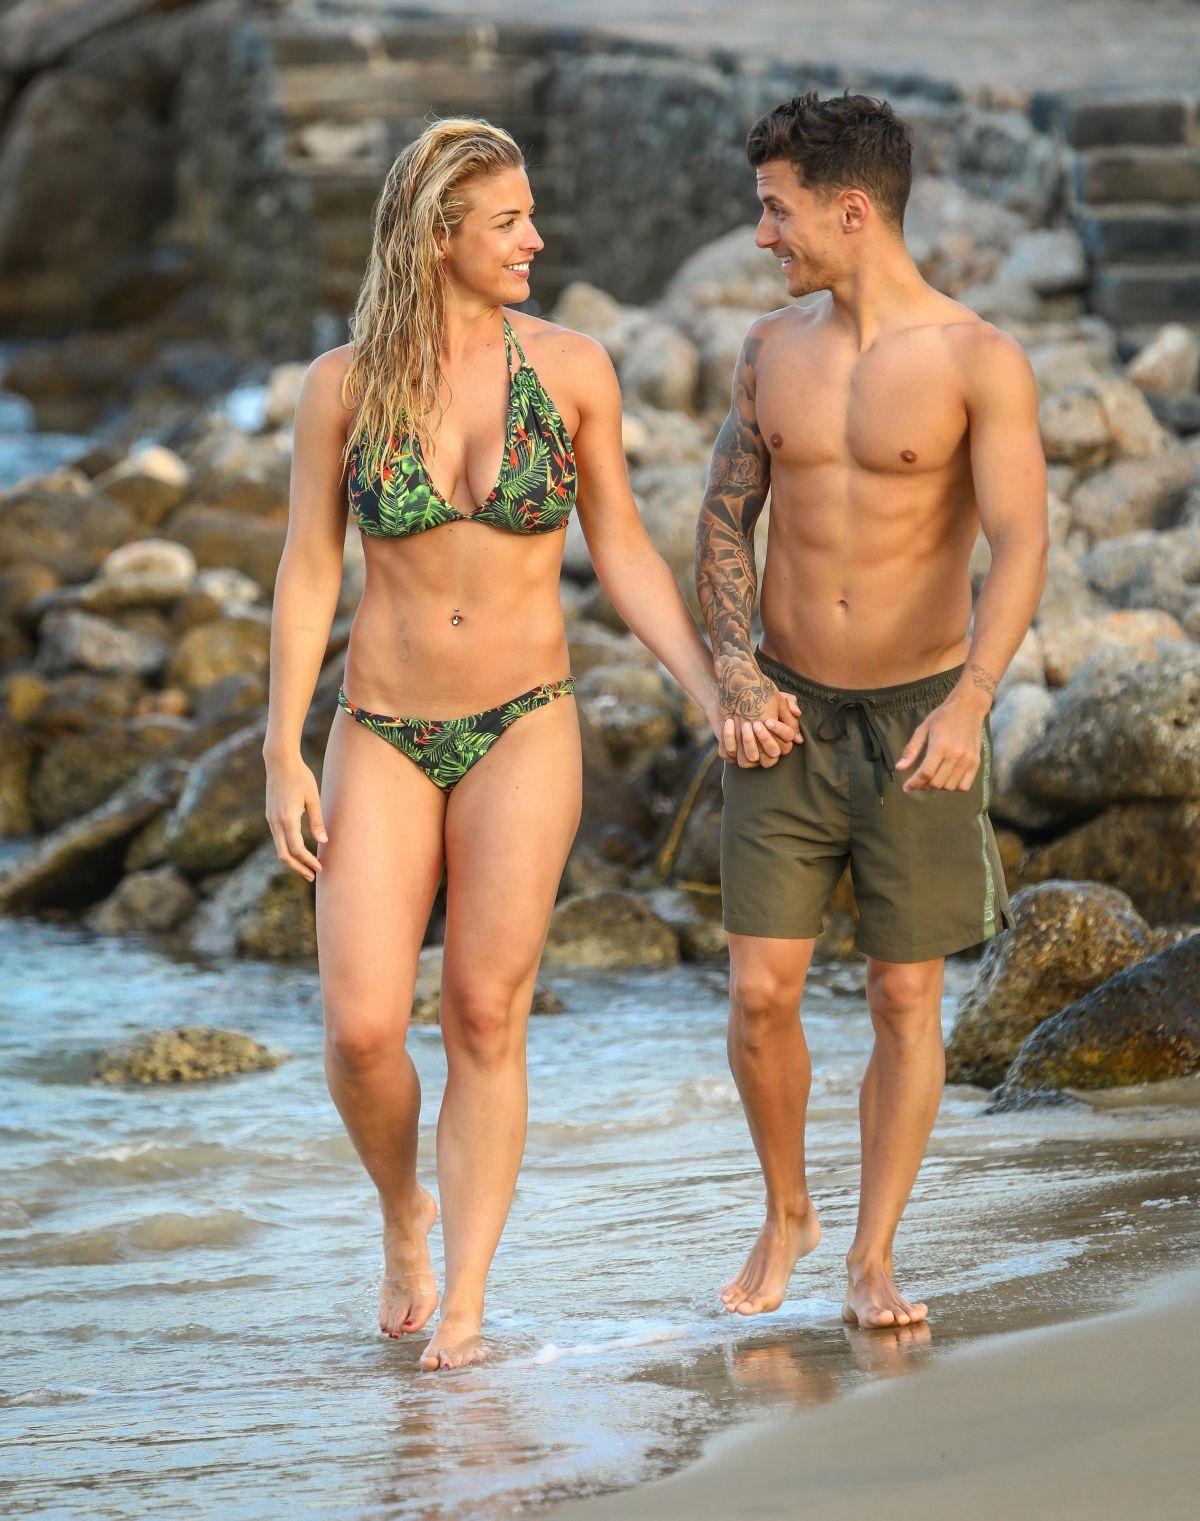 Gemma A 2018 Beach In At Bikini july Crete Atkinson vnPym80wNO